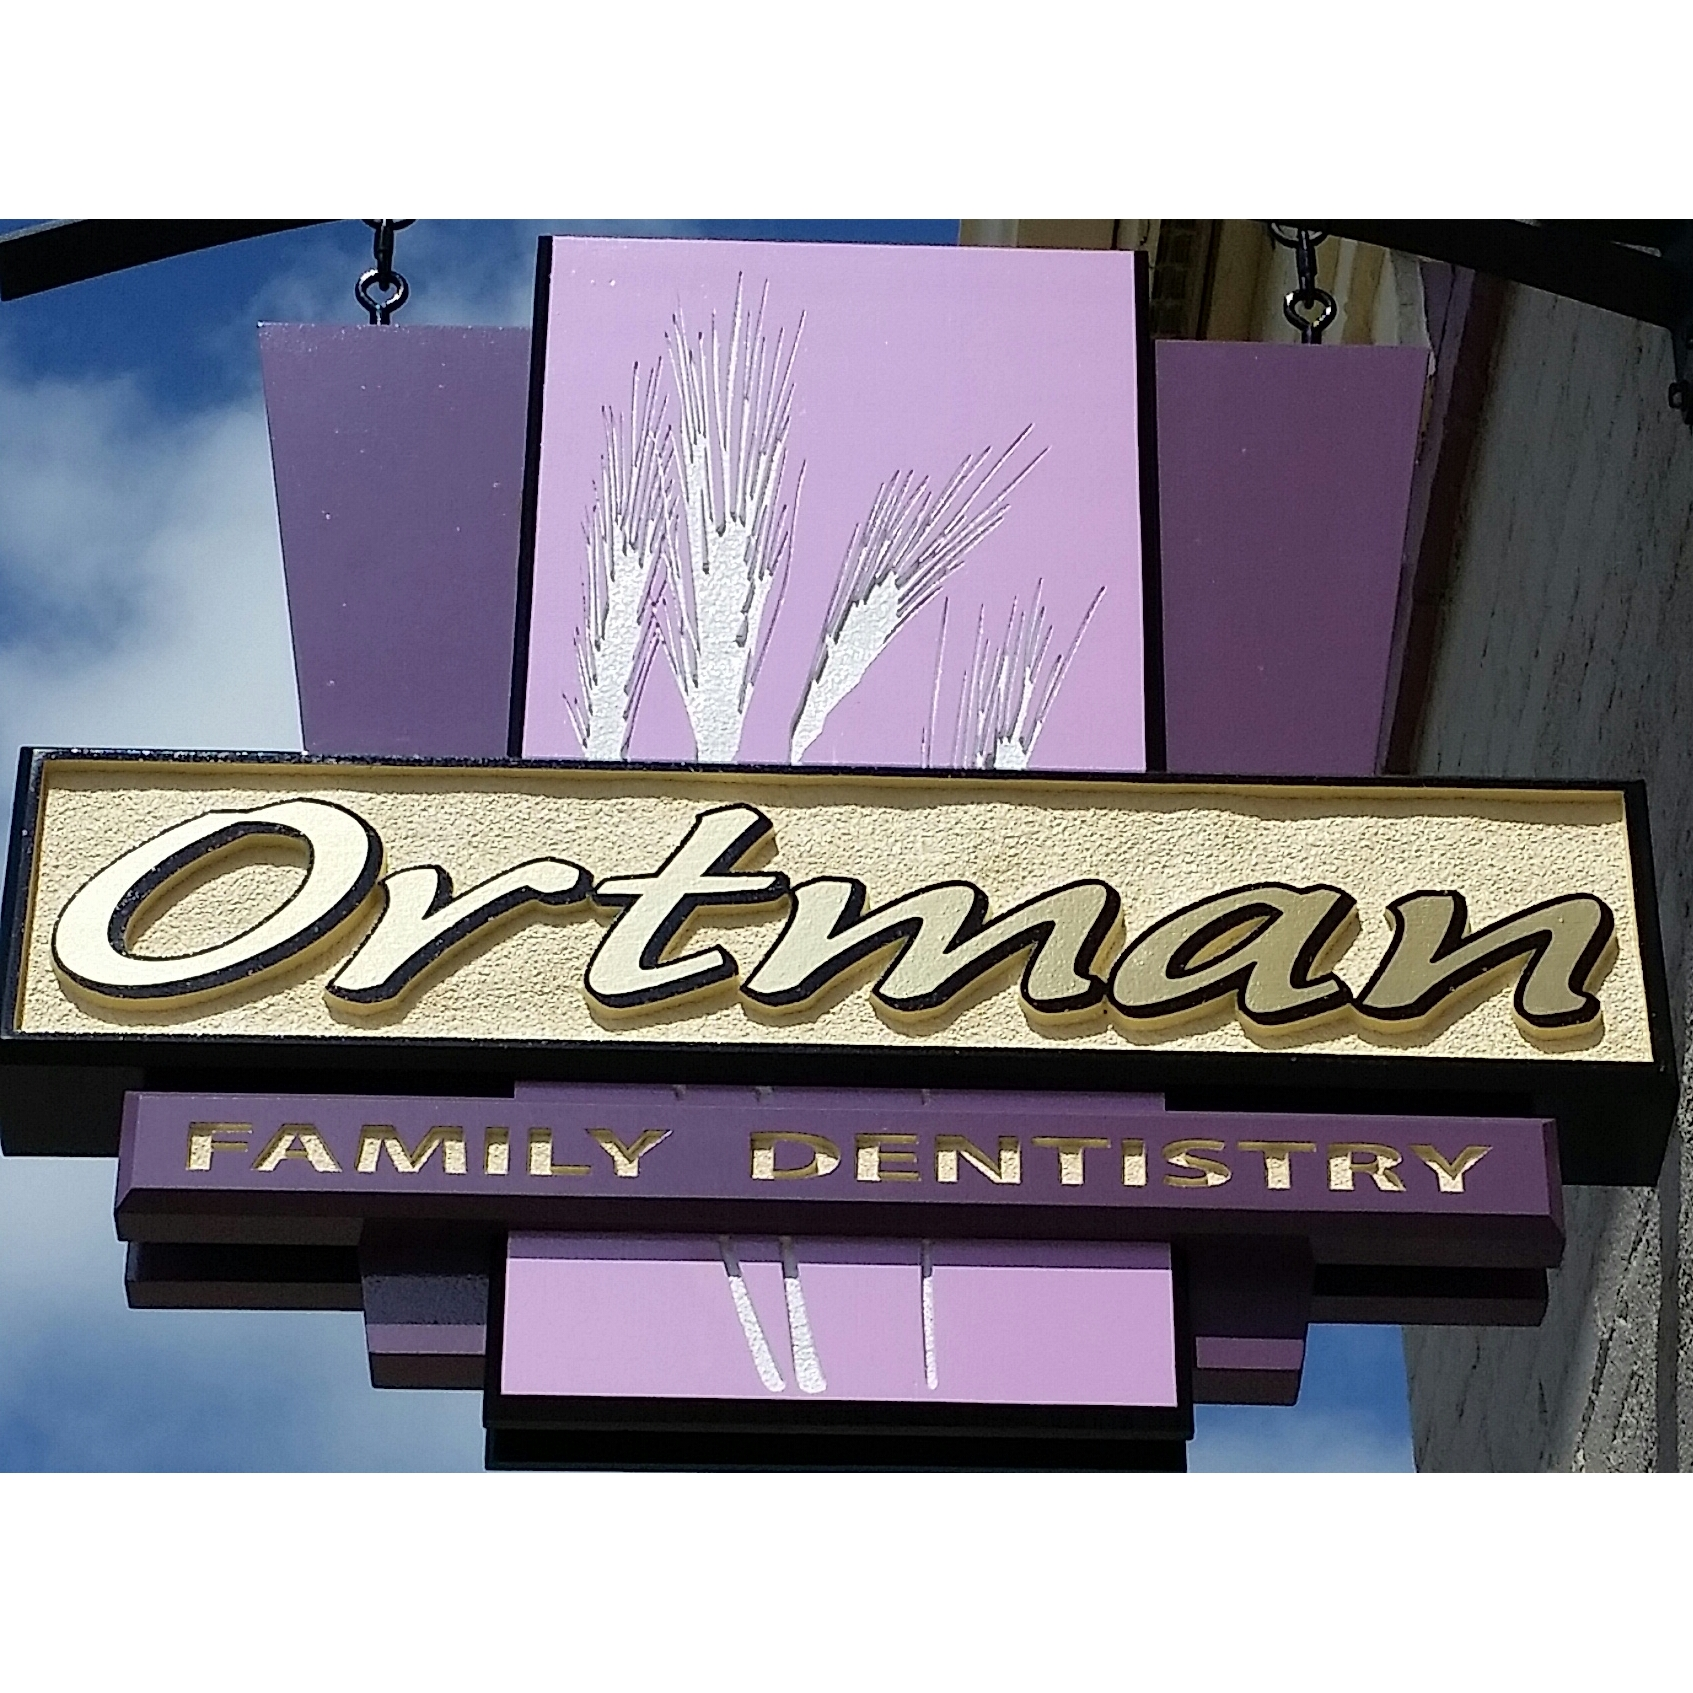 Ortman Family Dentistry